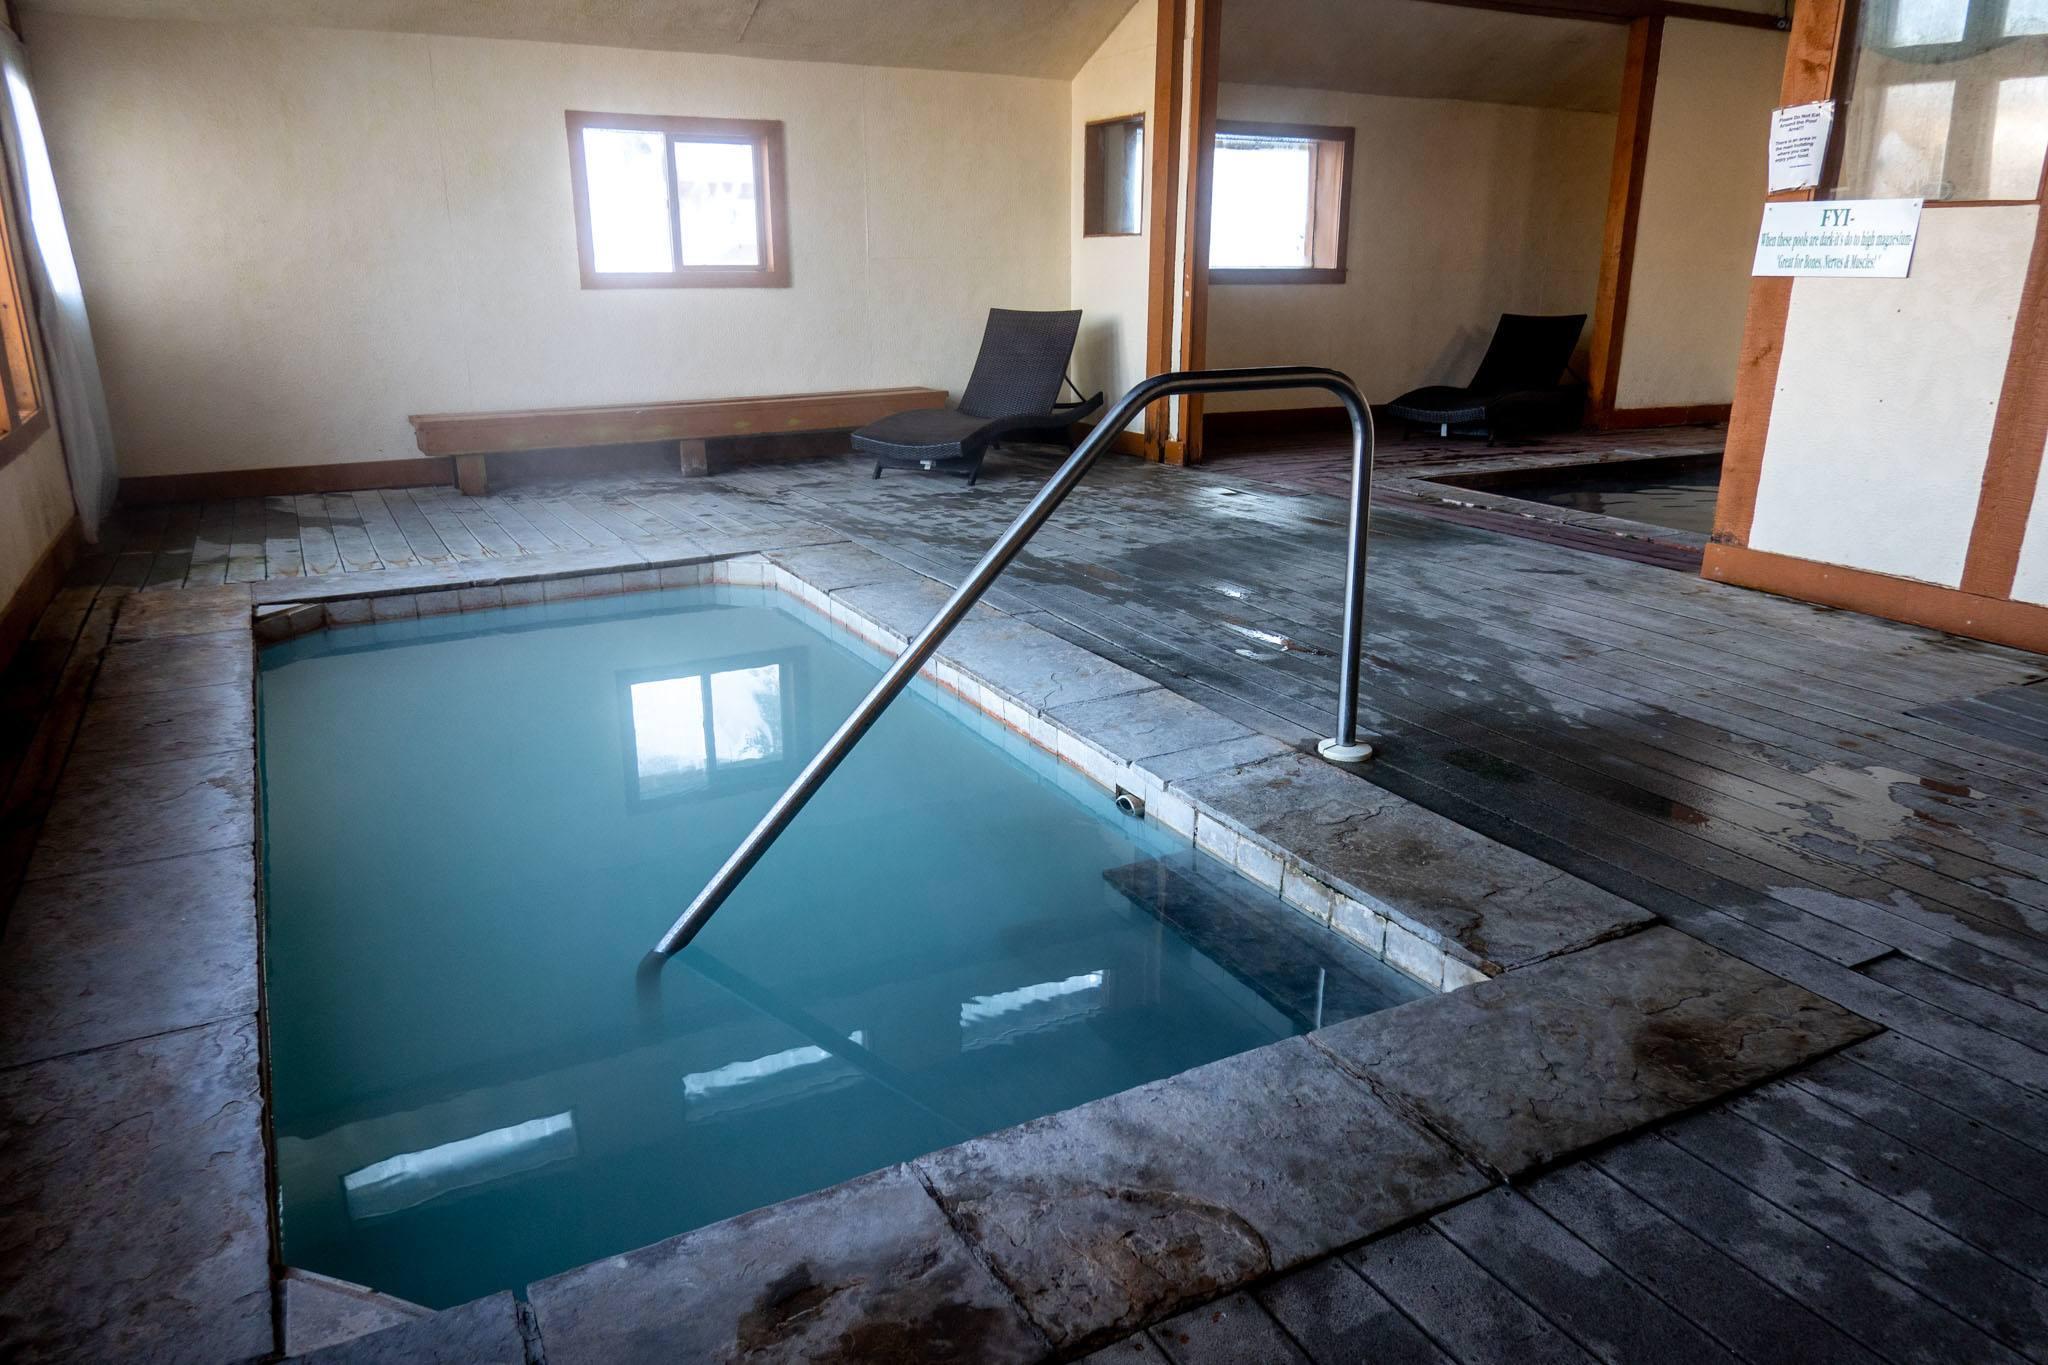 Indoor pool at the Hot Sulphur Springs Resort & Spa